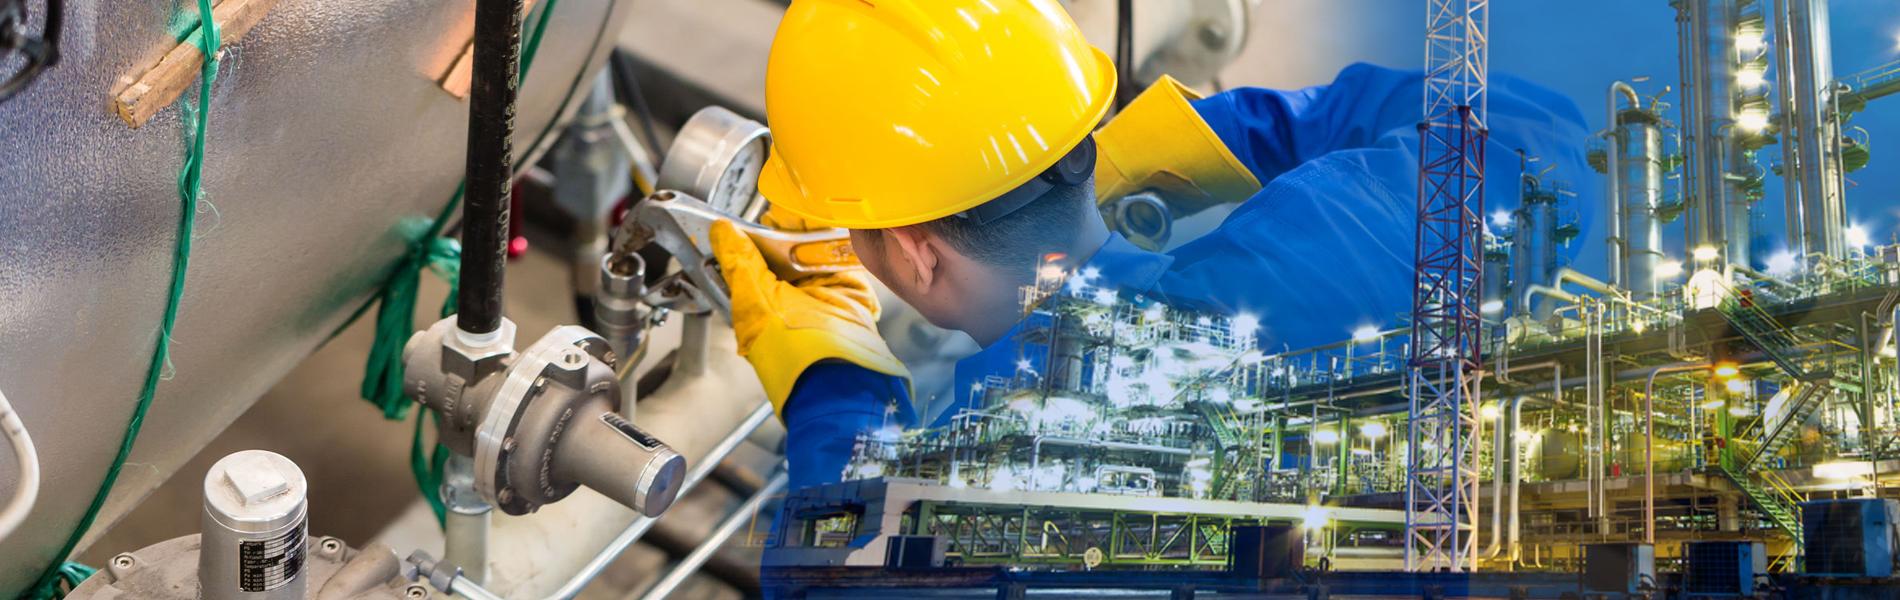 Manutenzione Impianti Industriali - Servizio di manutenzione H24 | Industrial Installations Maintenance